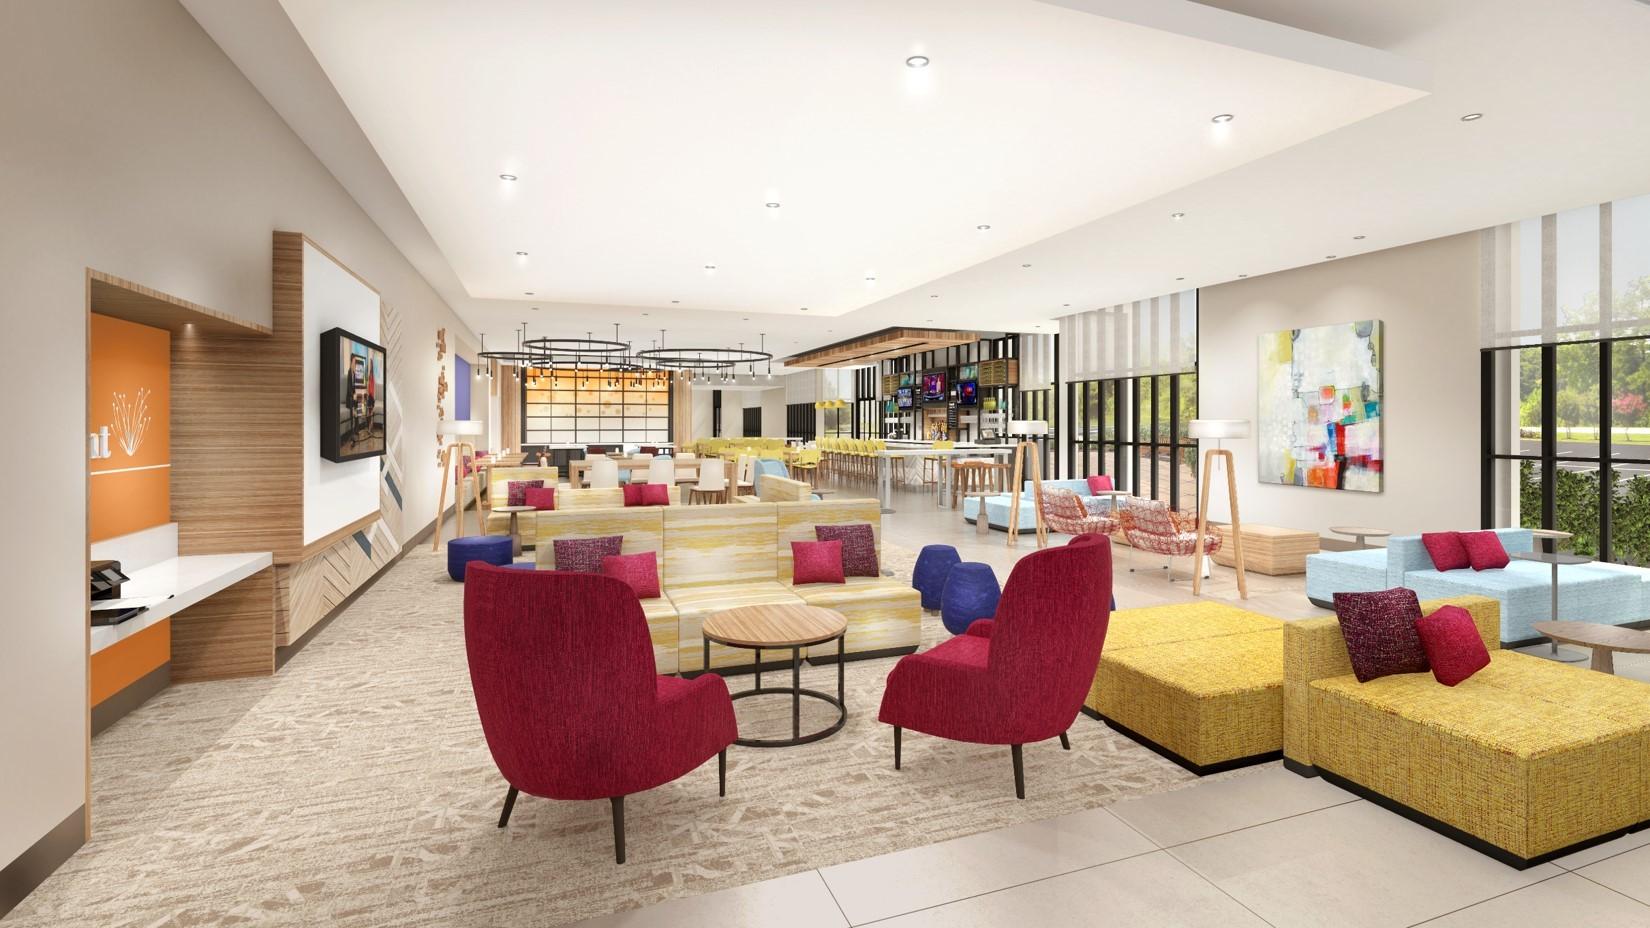 Hilton Garden Inn By Hilton  U2013 Hospitality Net